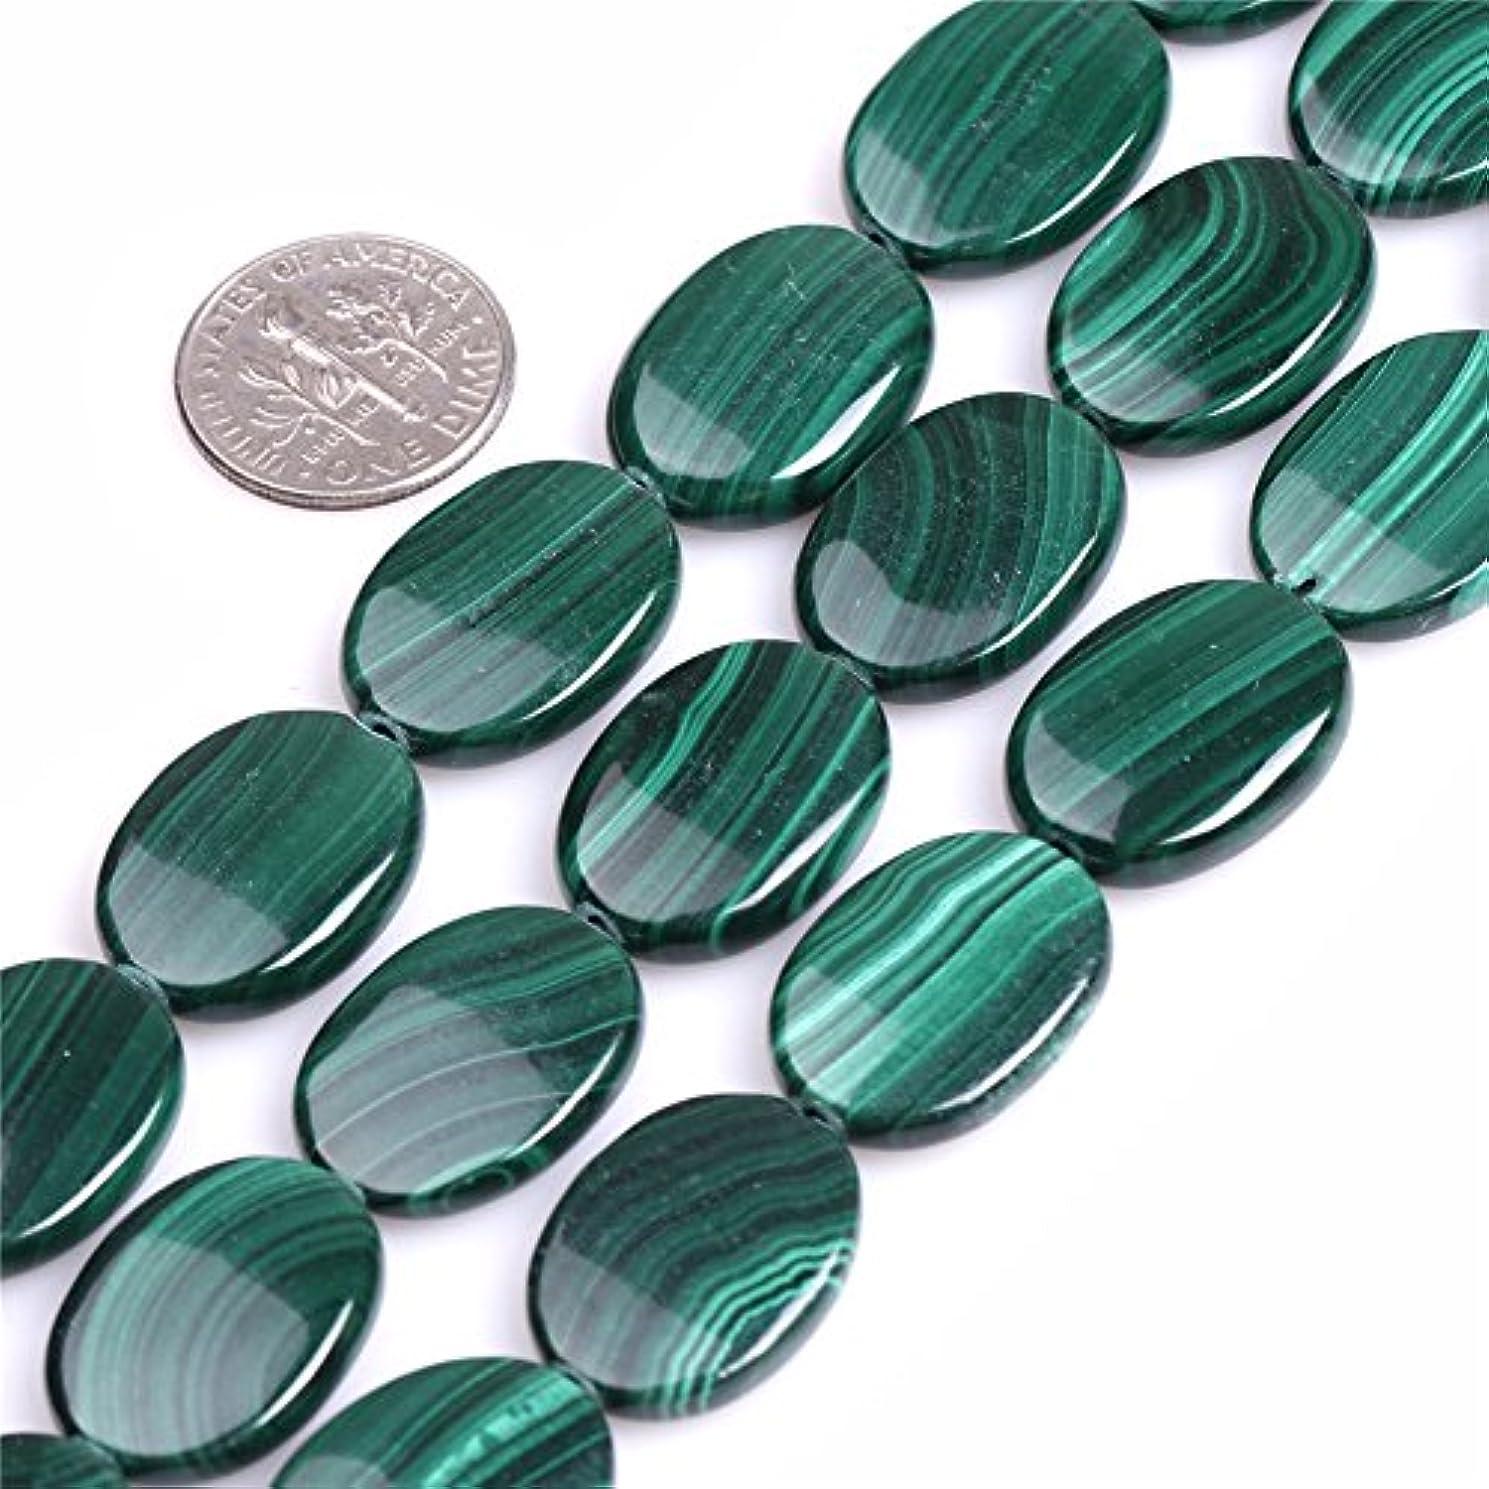 15x20mm Oval Gemstone Grade A Malachite Beads Strand 15 Inch Jewelry Making Beads